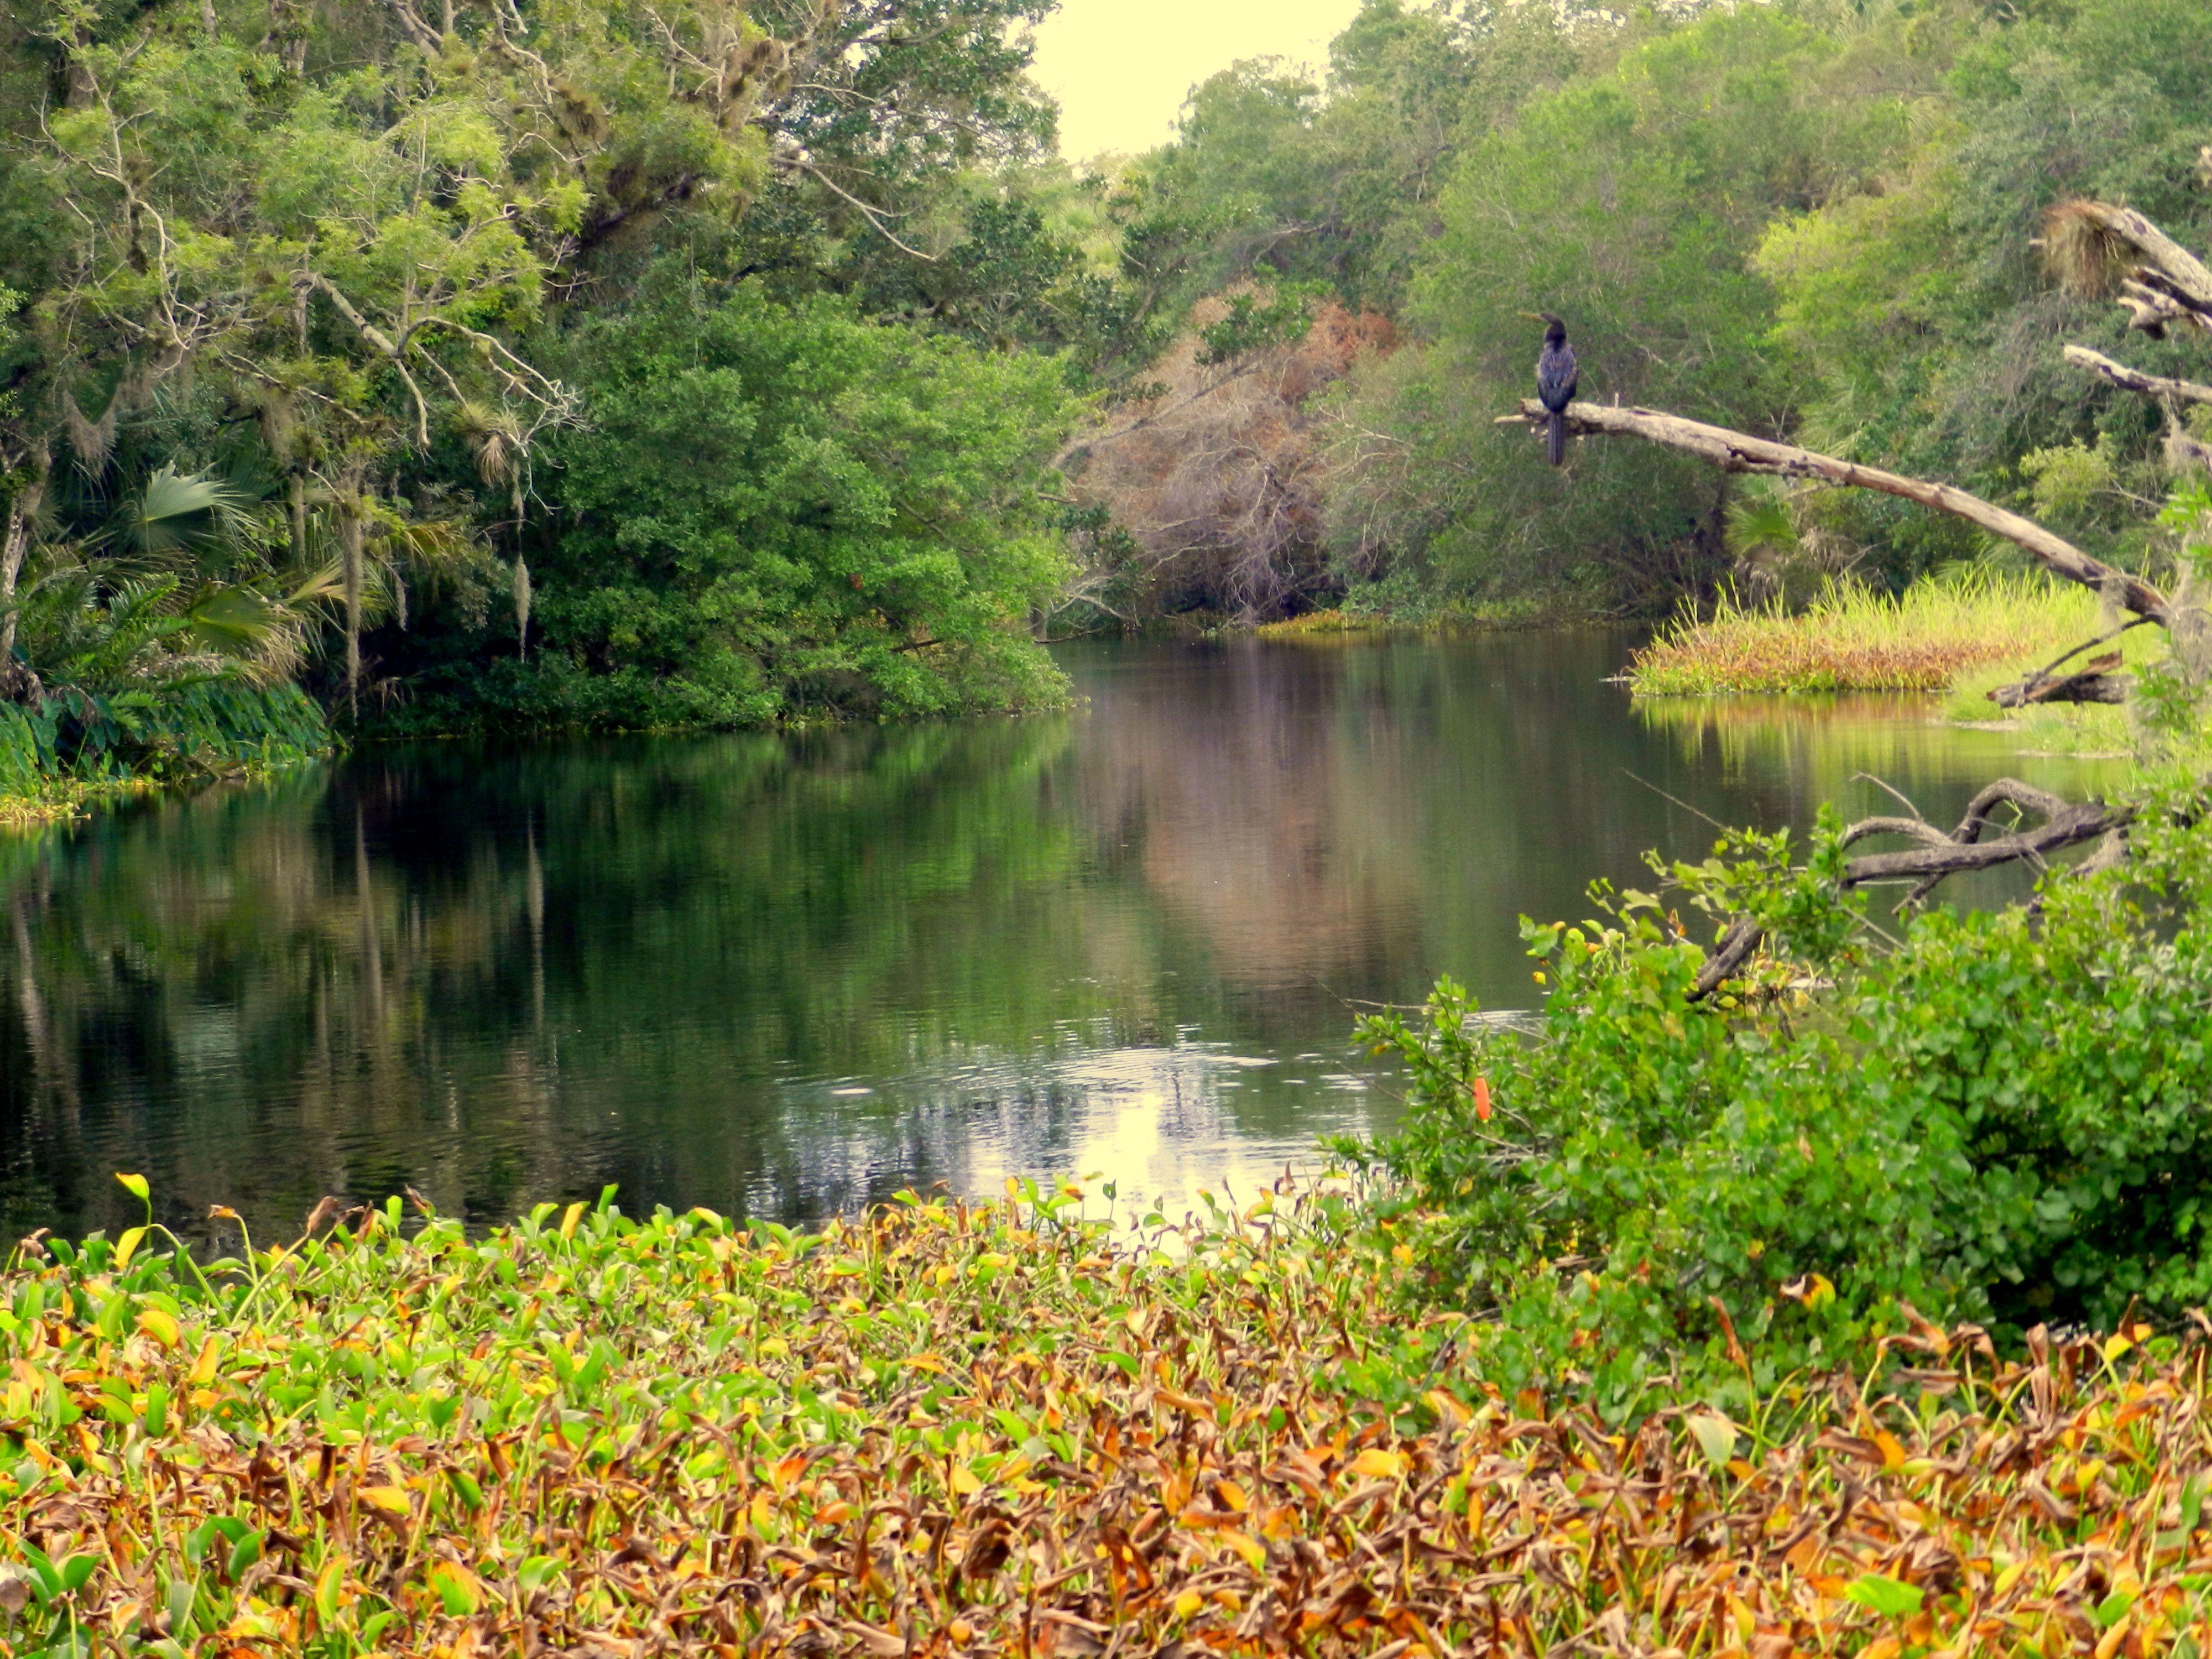 Bottlebrush tree - White City Park - Fort Pierce, FL - photo by ...